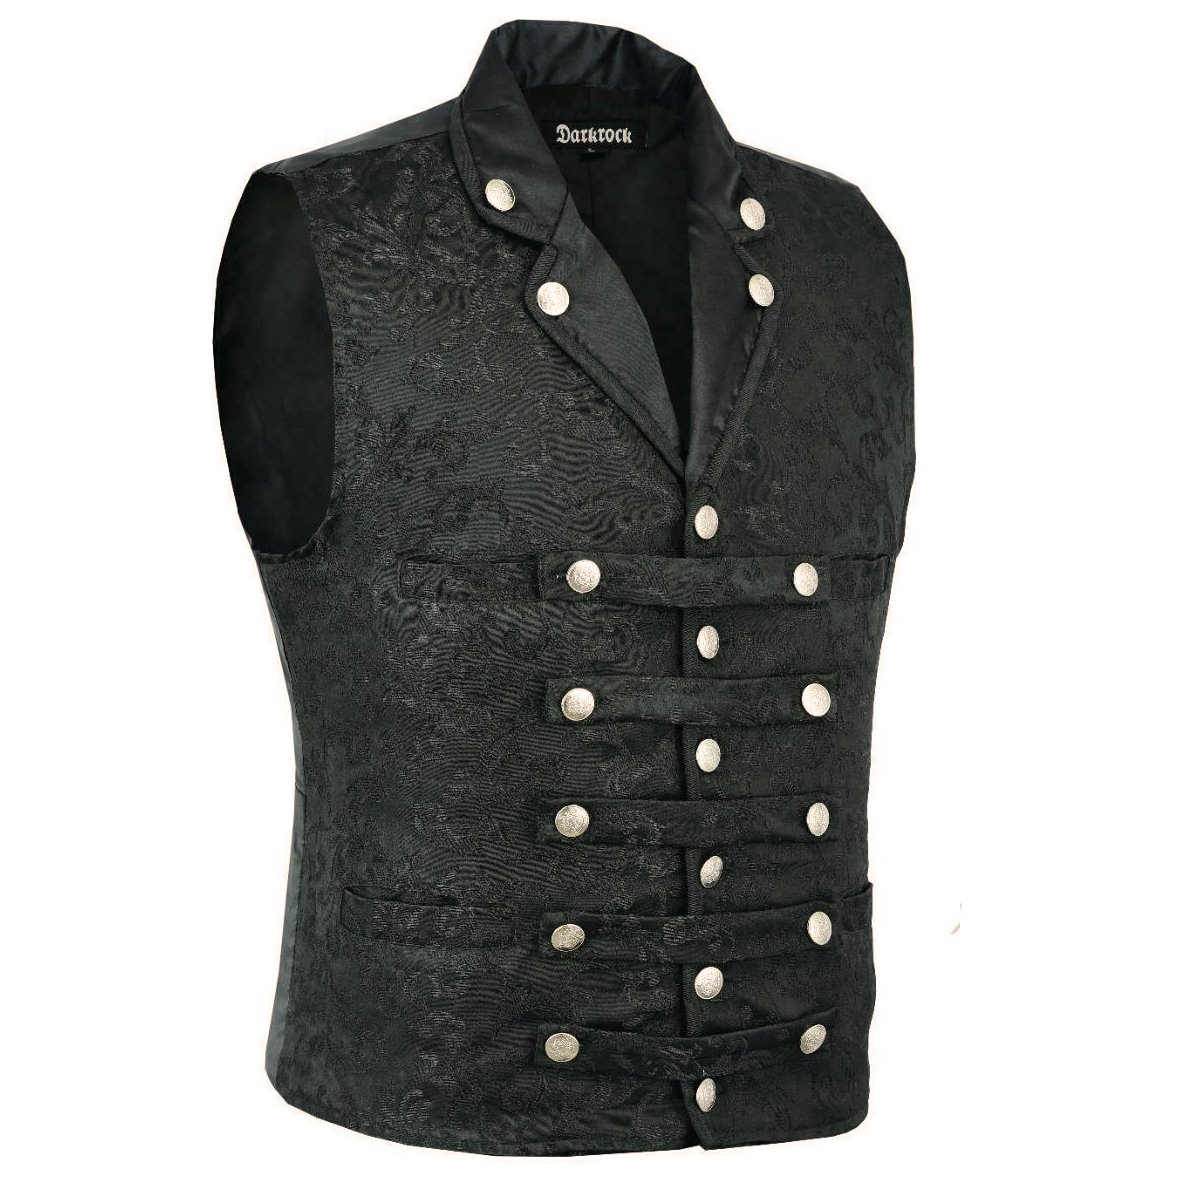 DARKROCK Men's Victorian Steampunk Captain Black Brocade Waistcoat (1)